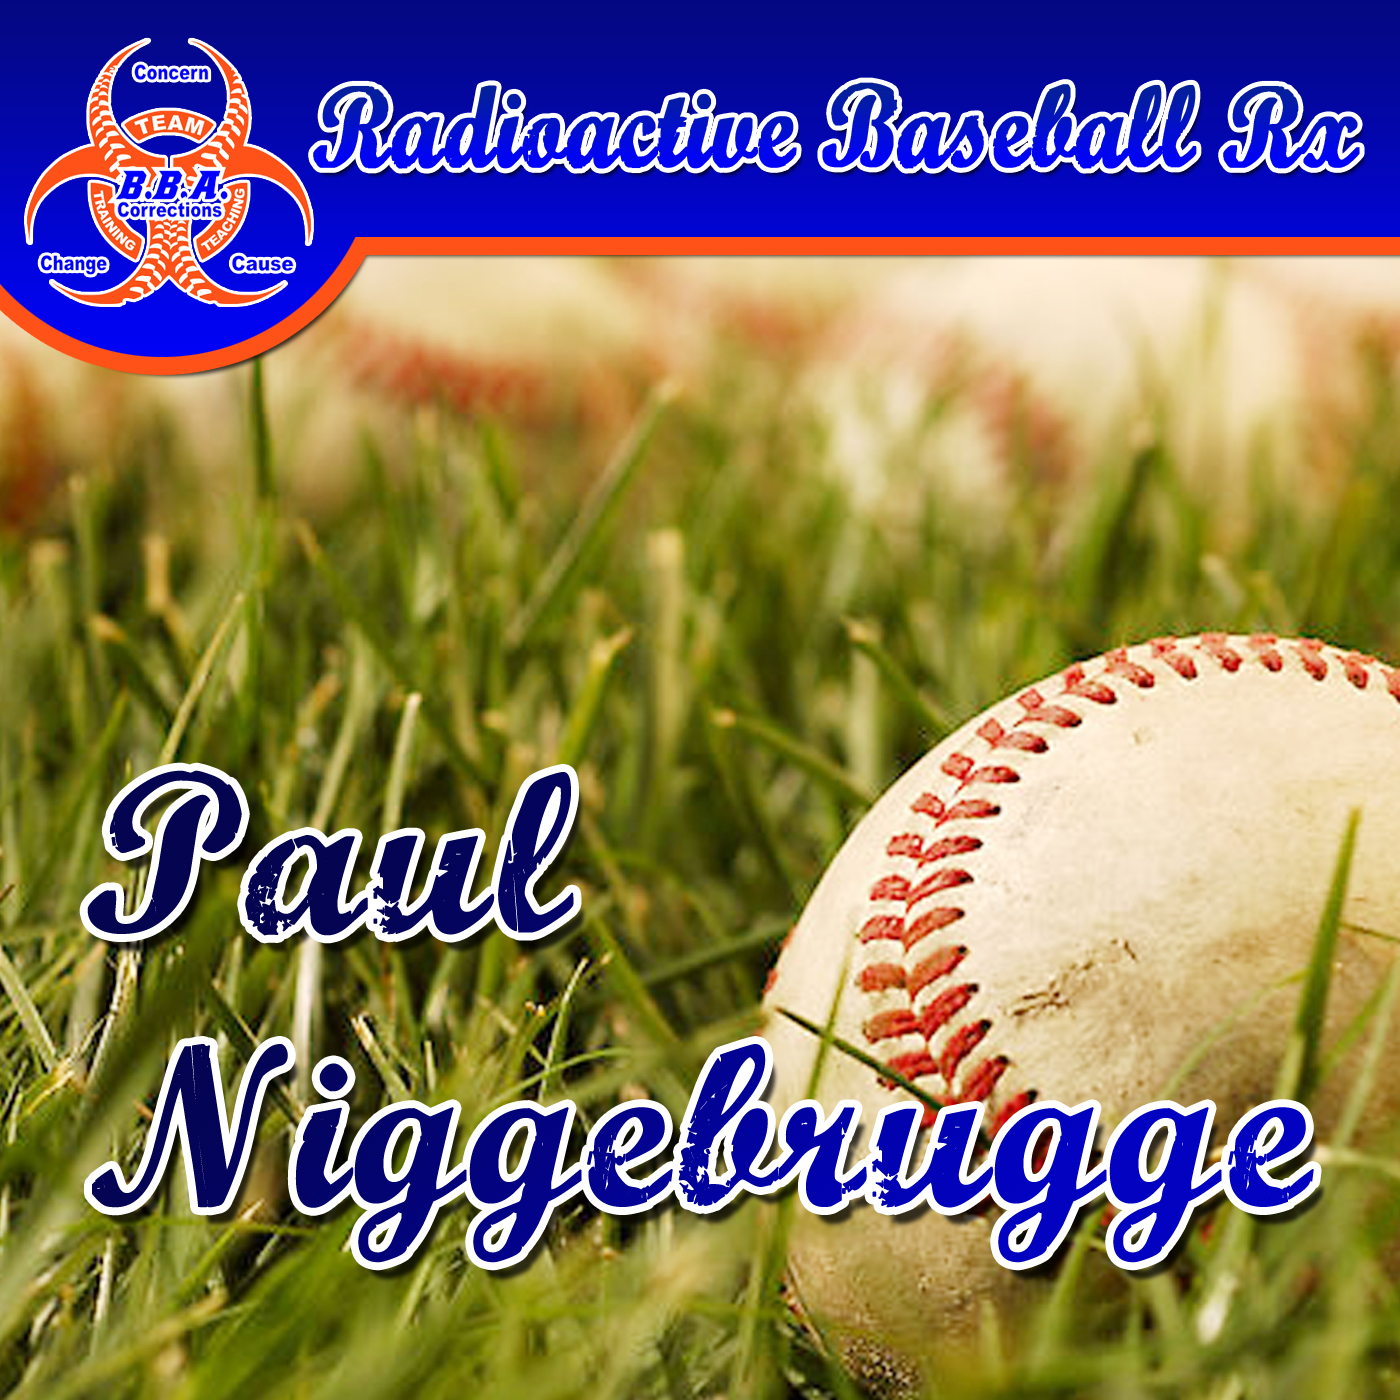 <![CDATA[Radioactive Baseball Rx]]>